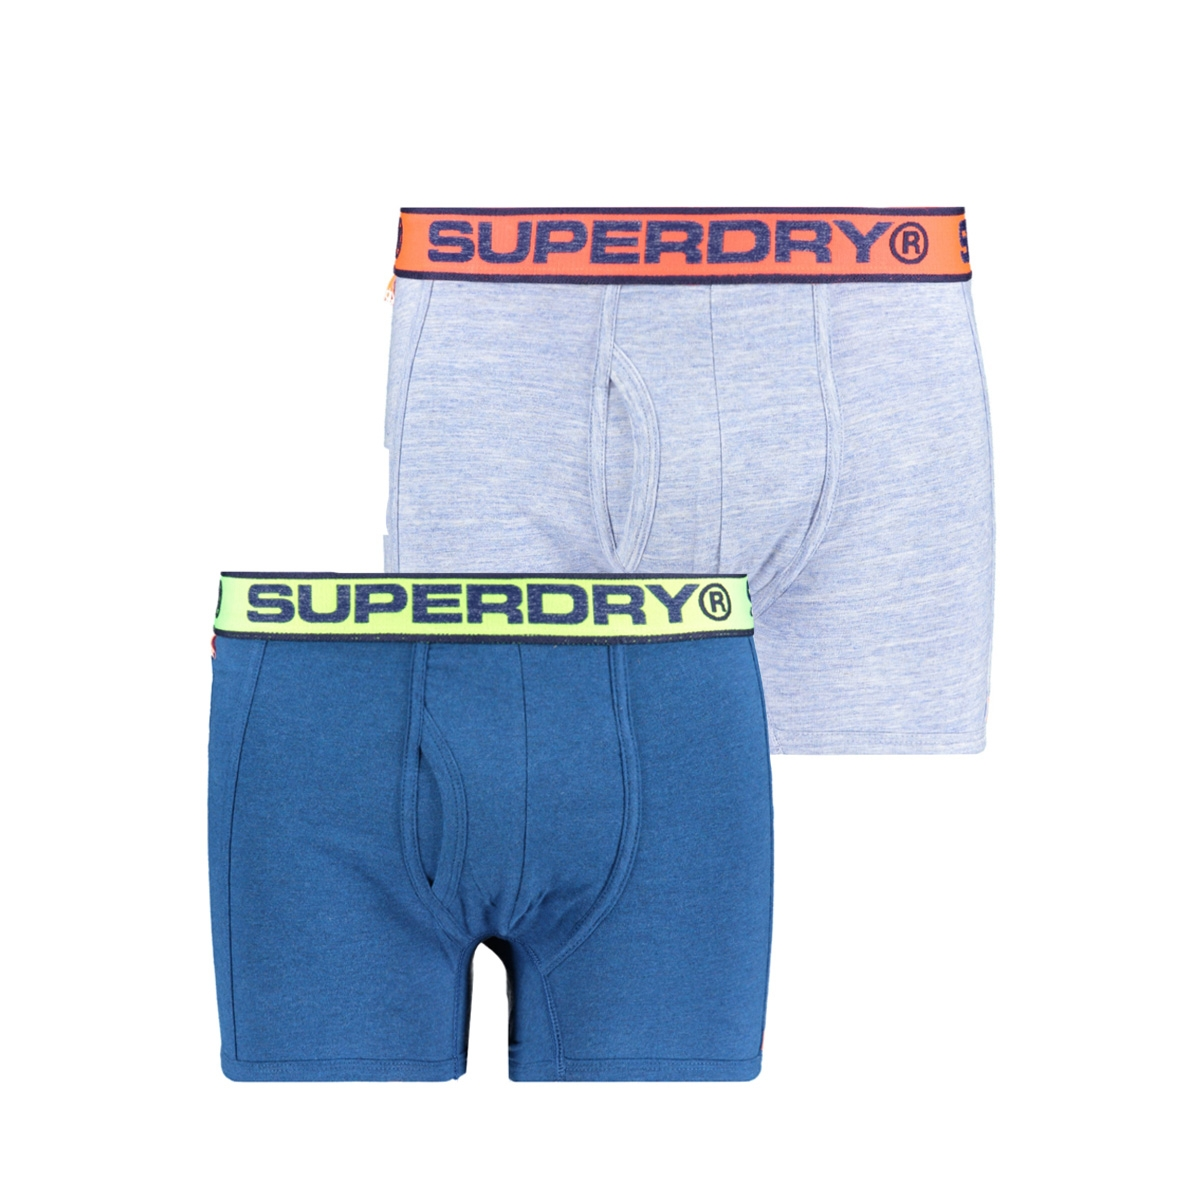 sport boxer dbl pack m3100019a superdry ondergoed milton blue marl